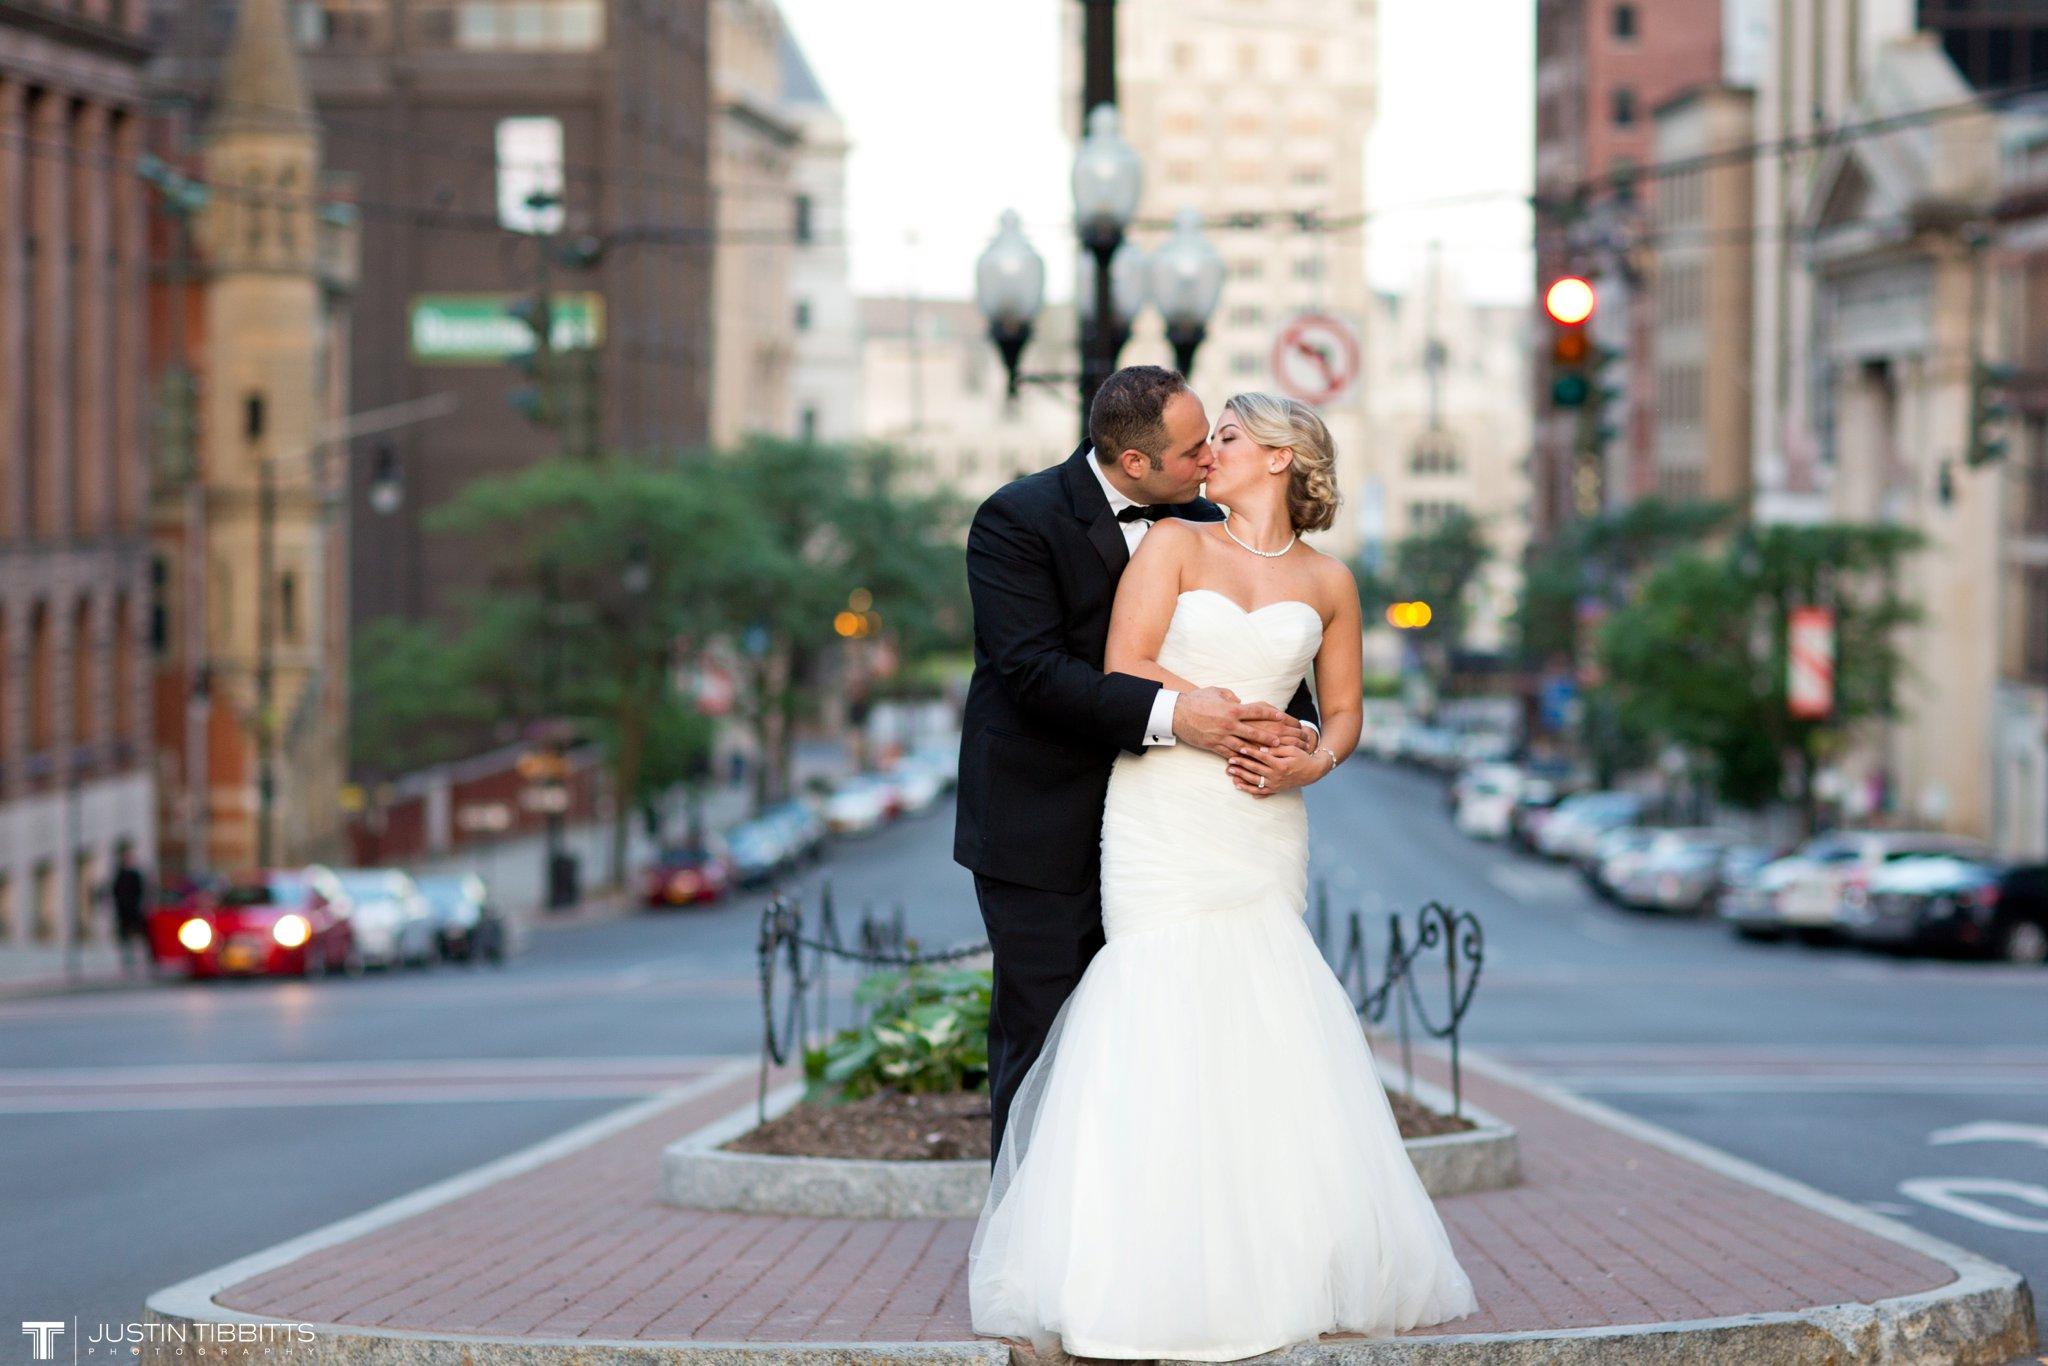 state-room-wedding-photos-with-amanda-and-nick_0171